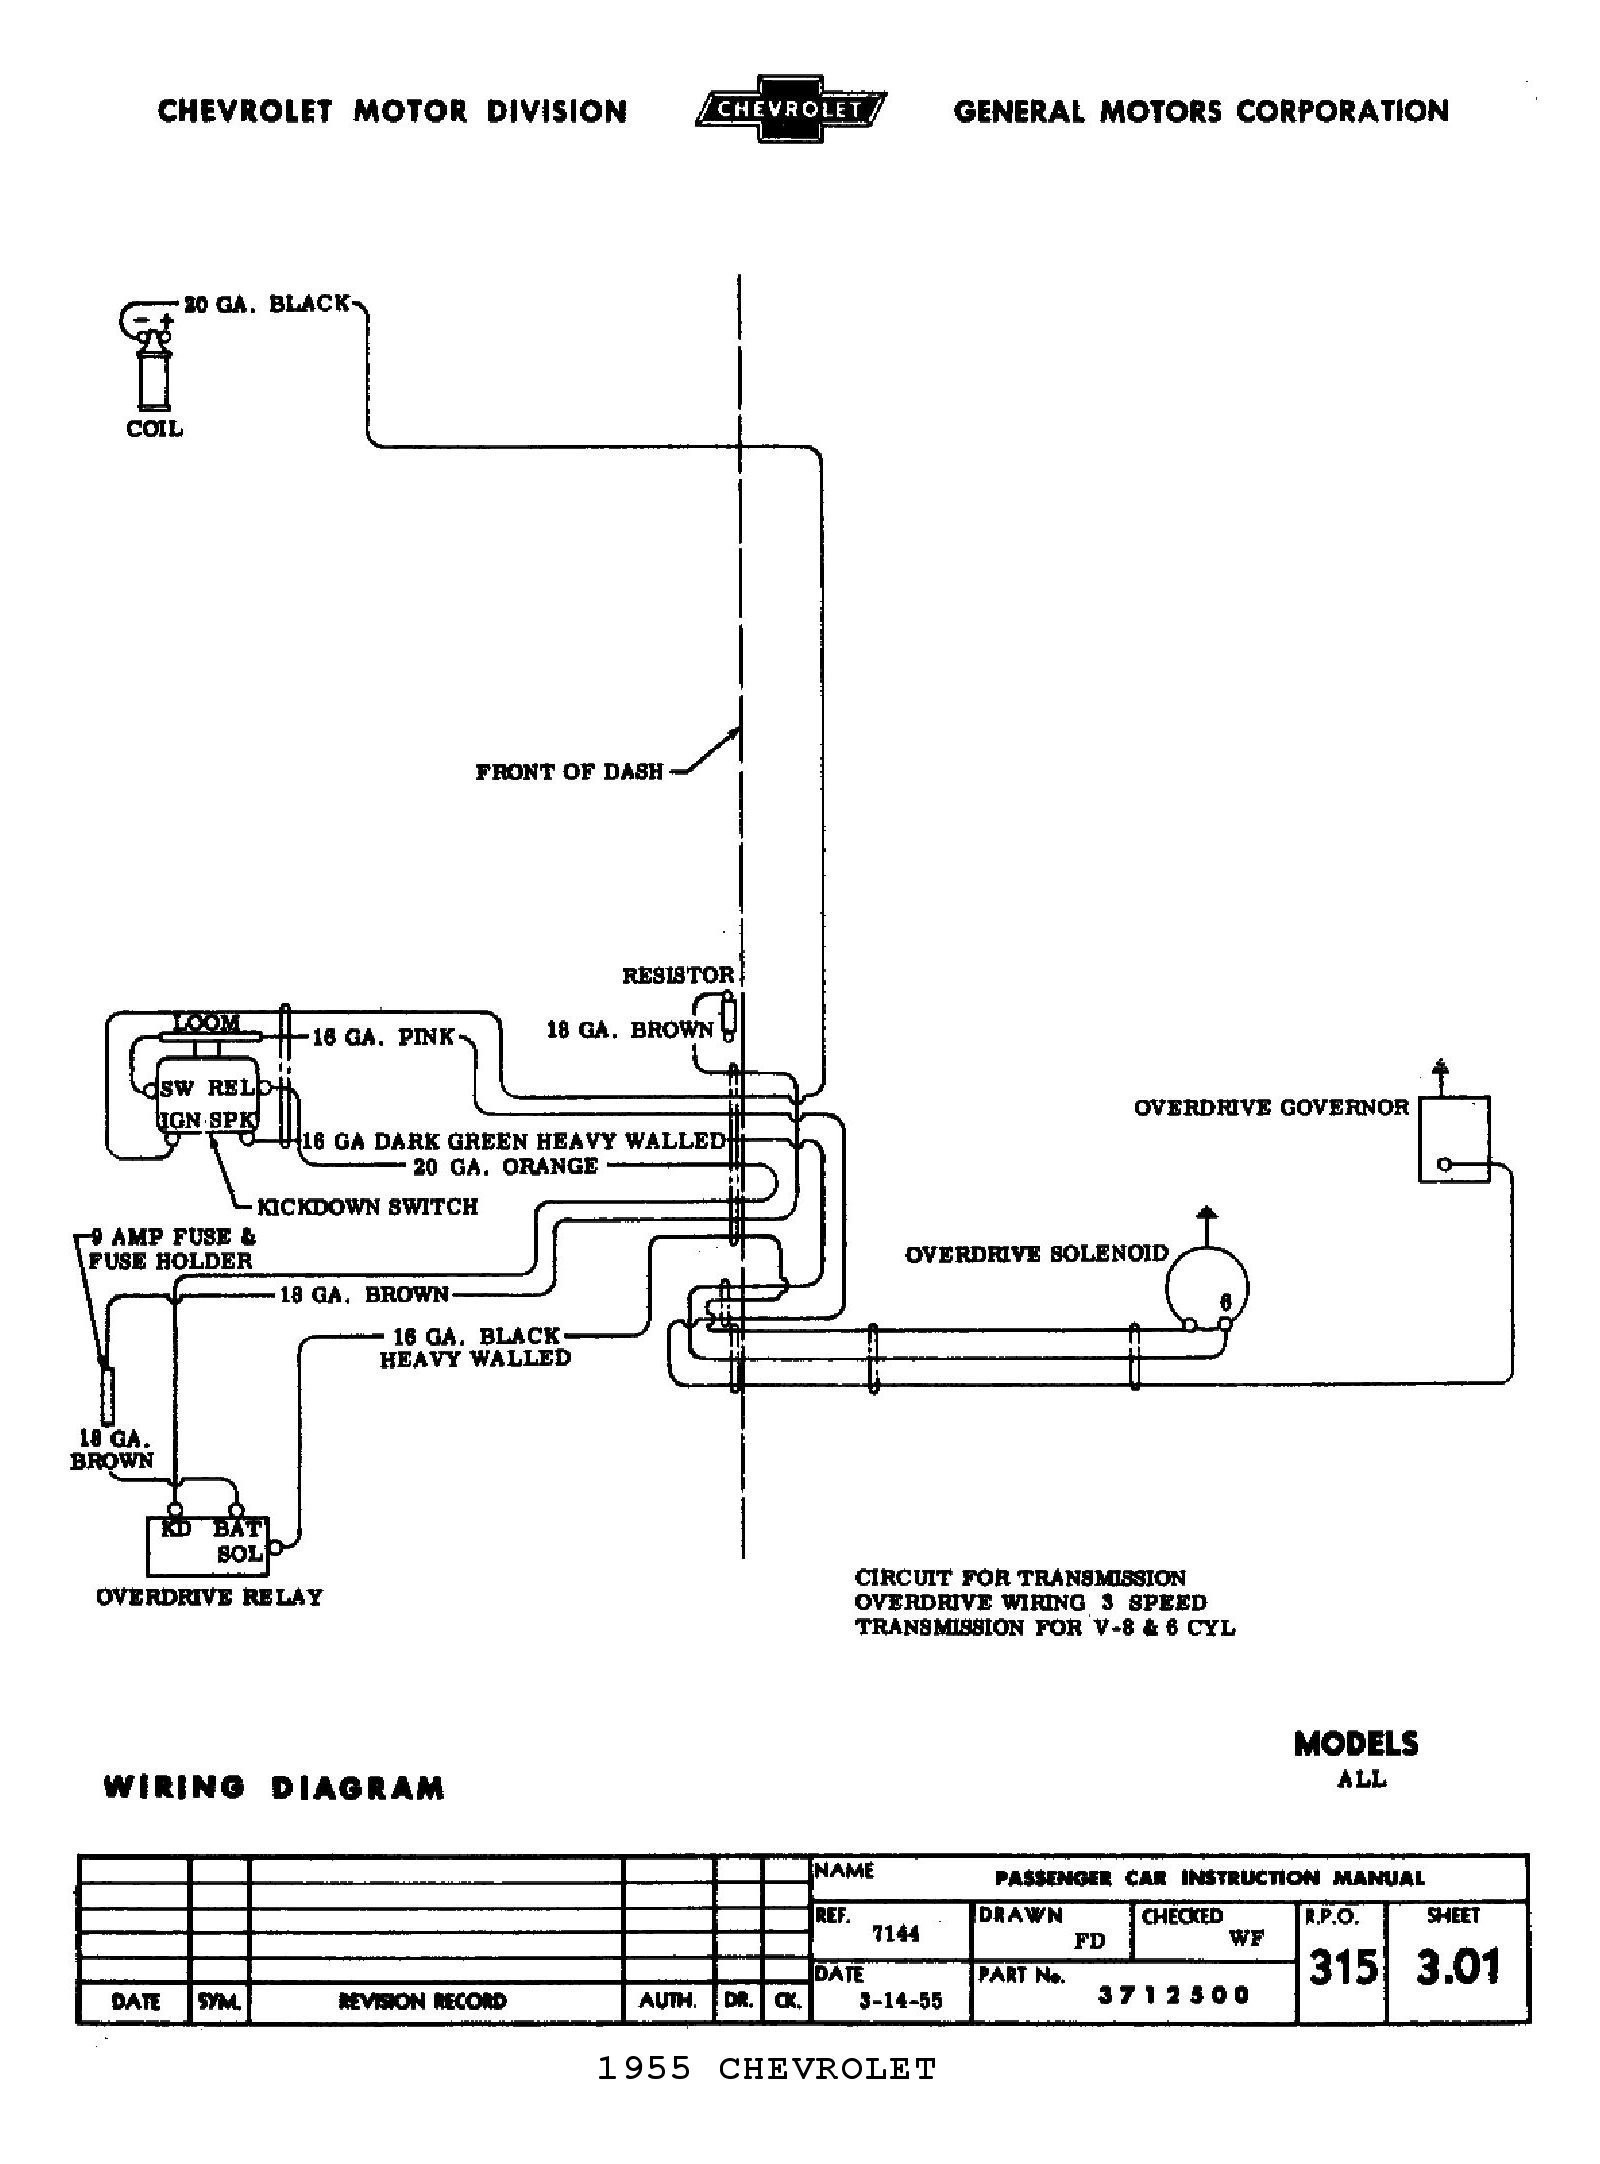 55 Chevy Wiring | Wiring Diagram - Ididit Steering Column Wiring Diagram